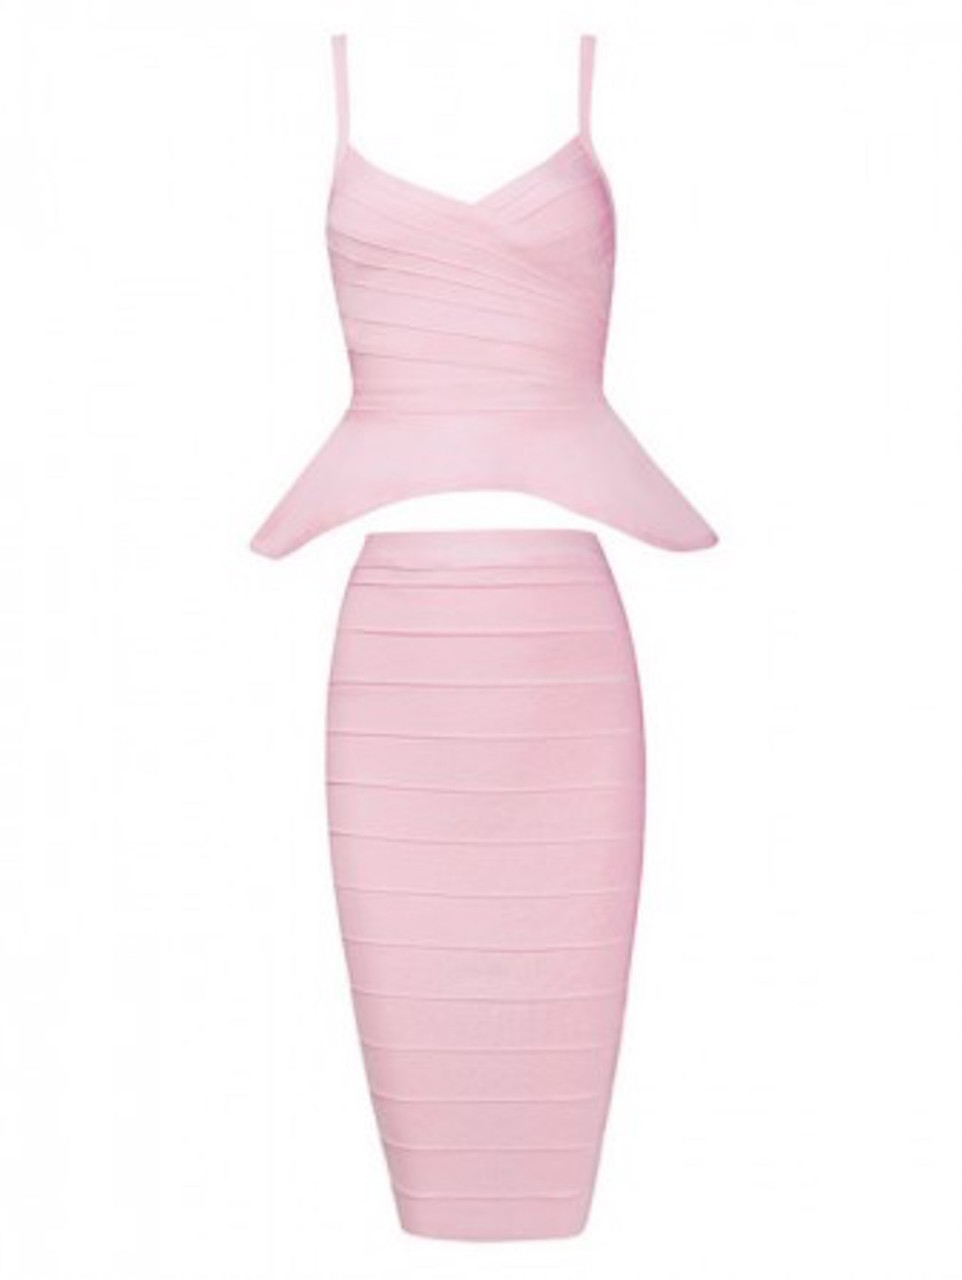 Baby Pink Two Piece Peplum Top Midi Bandage Dress Skirt